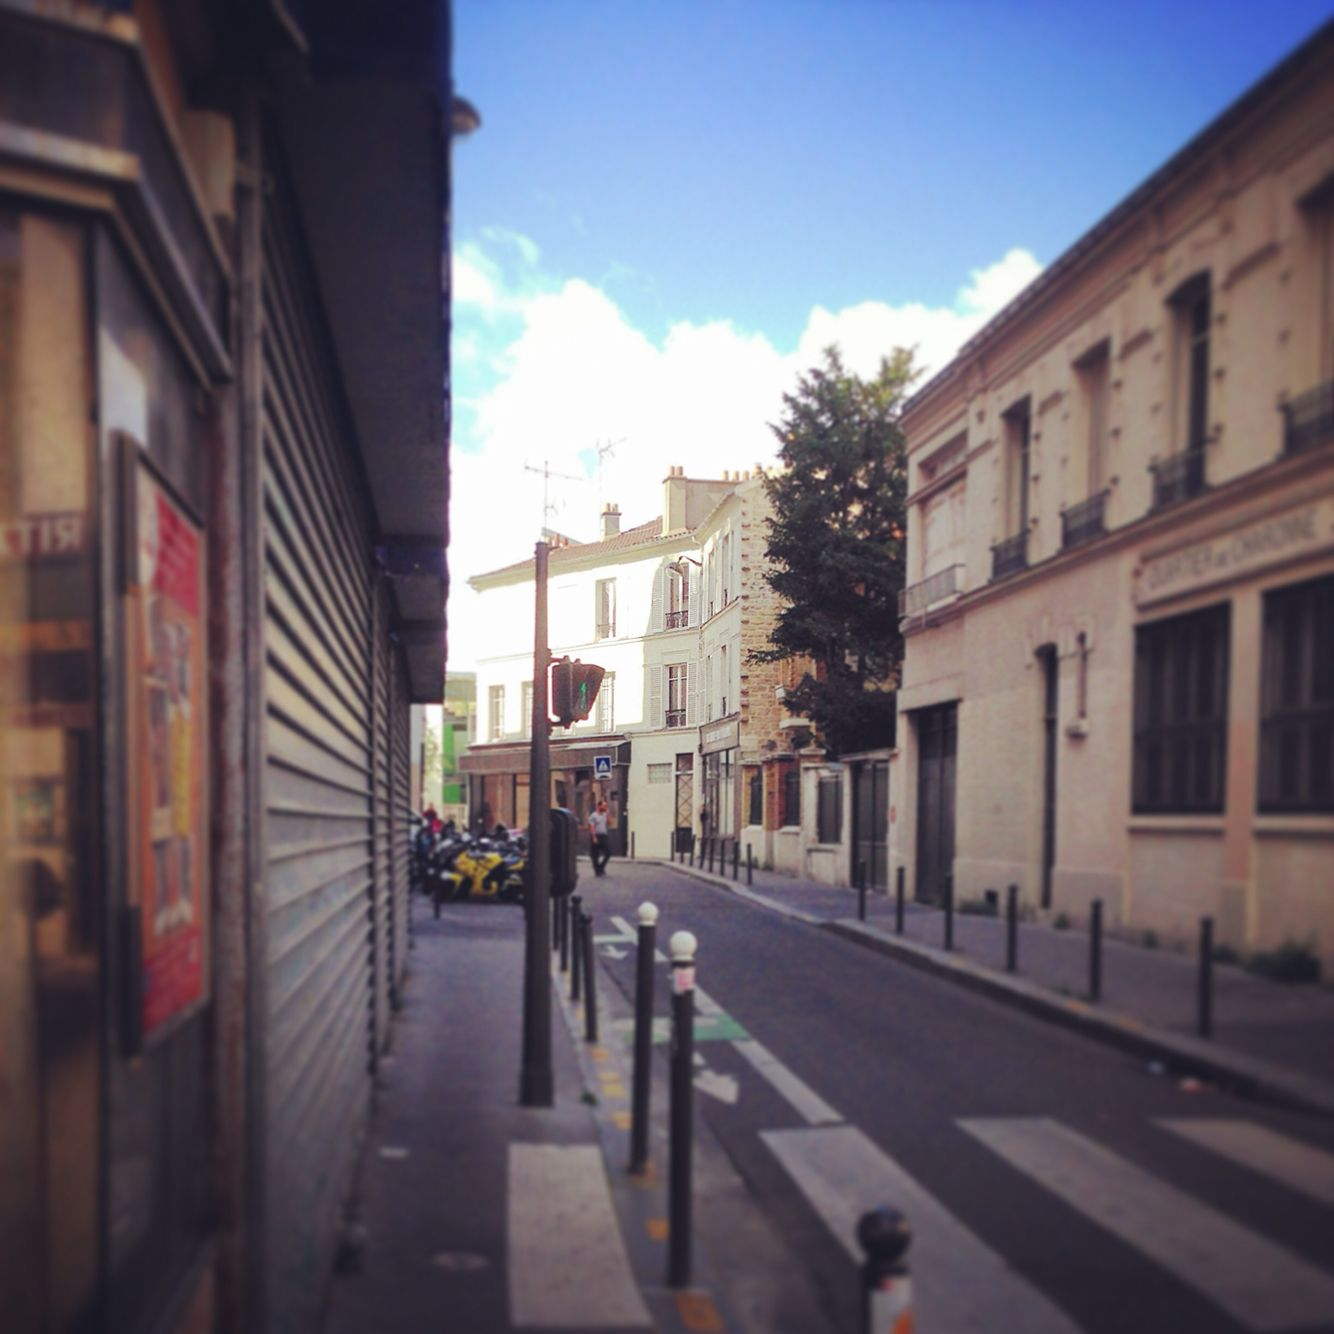 Small alley in Paris